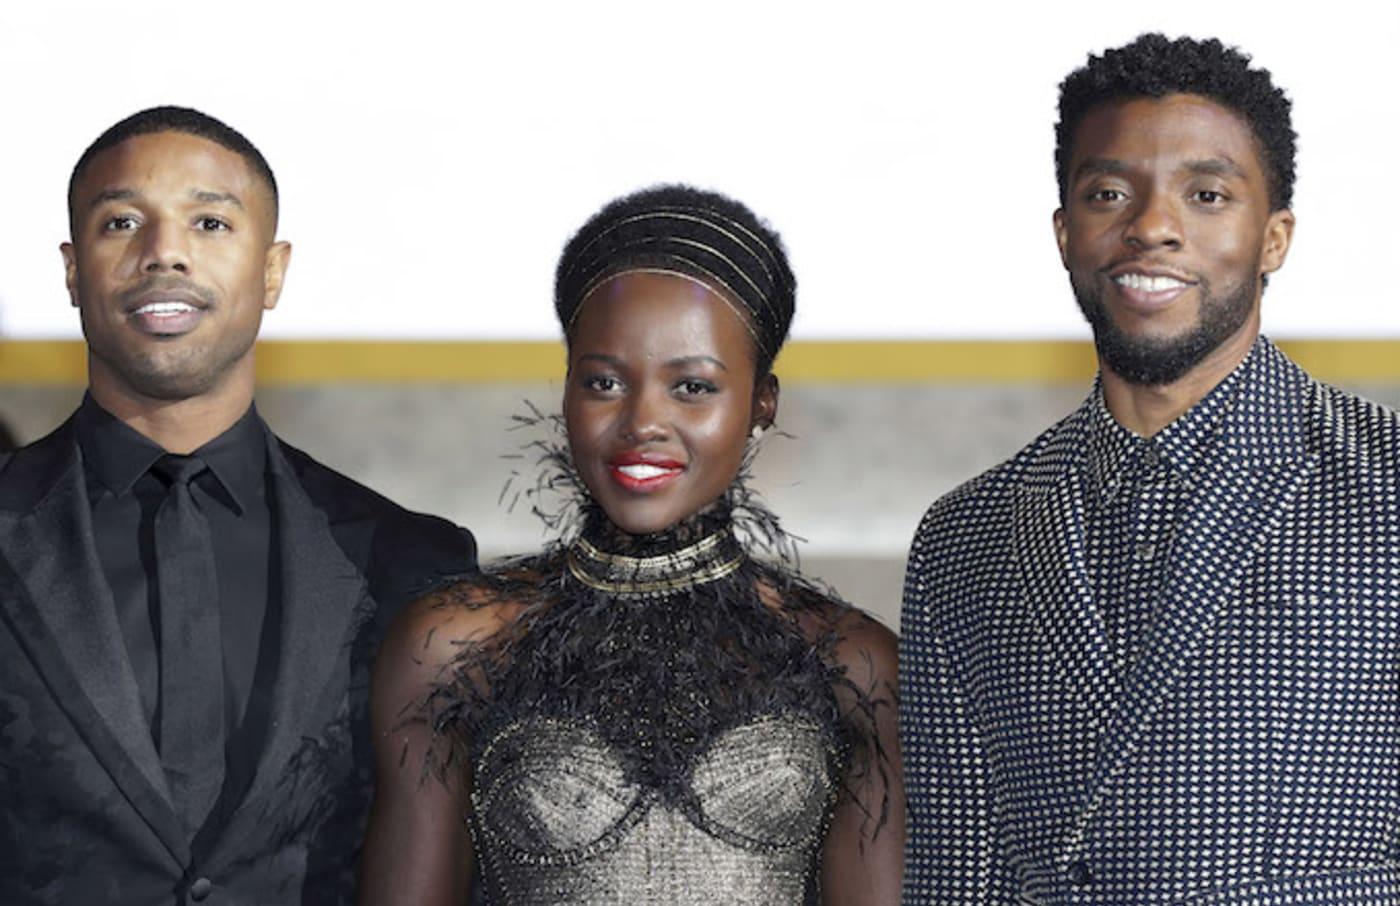 Michael B. Jordan, Lupita Nyong'o, and Chadwick Boseman at a 'Black Panther' premiere.